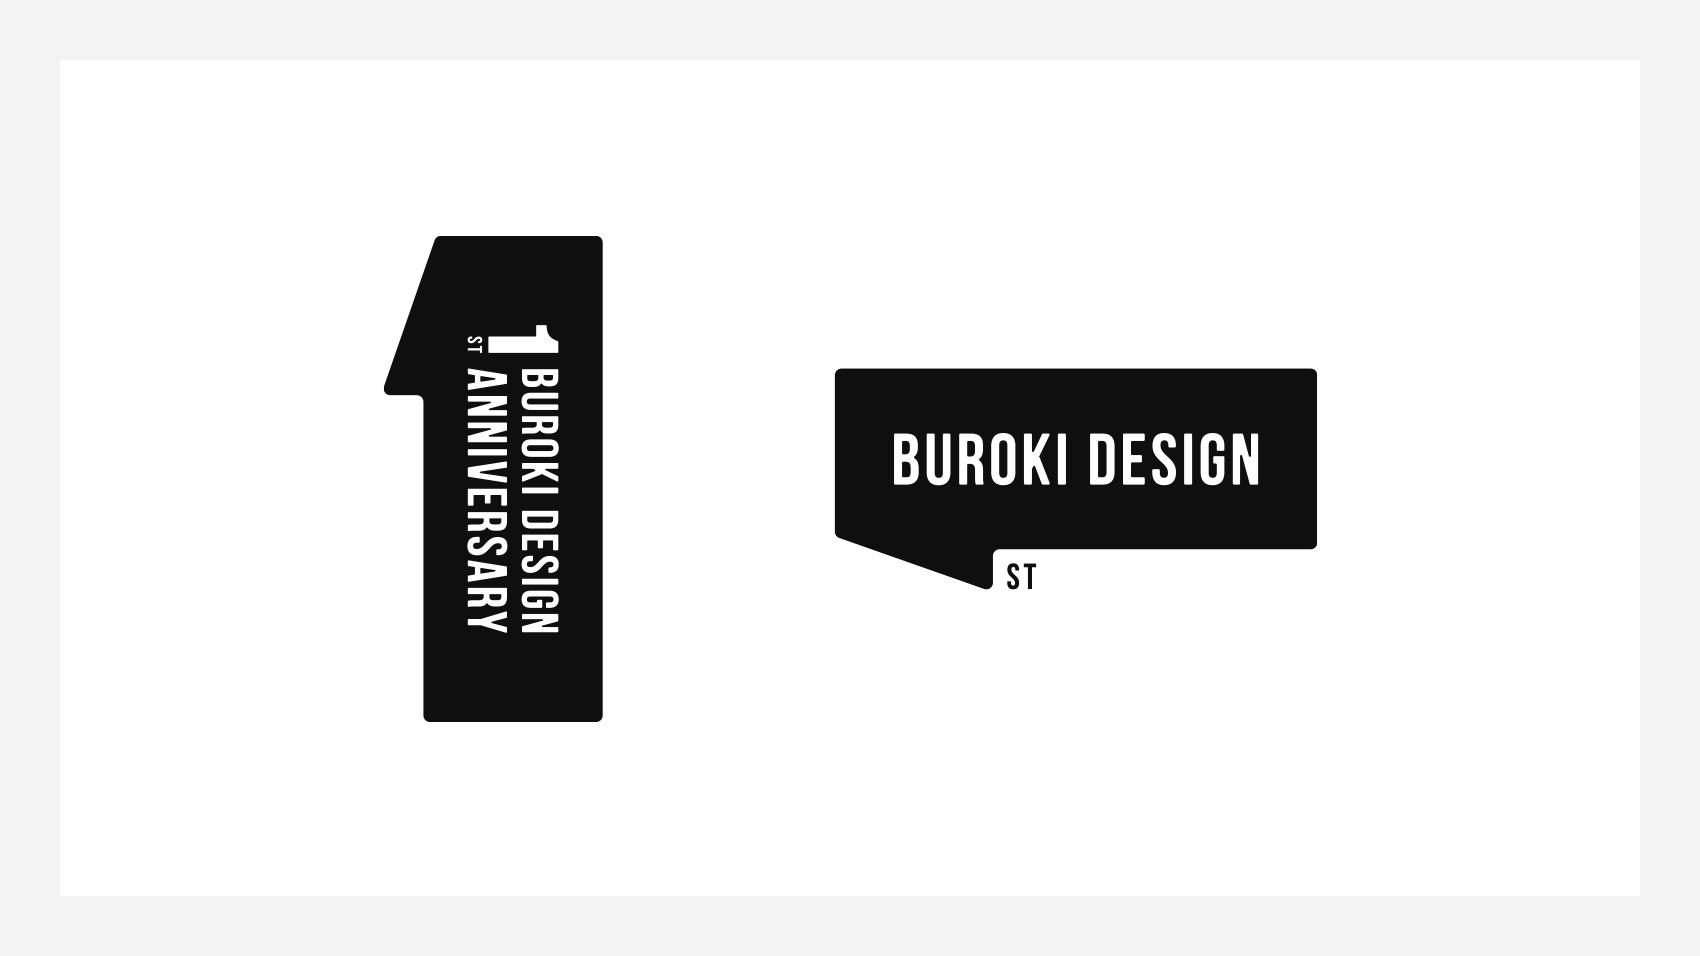 BUROKI design 1周年ロゴ